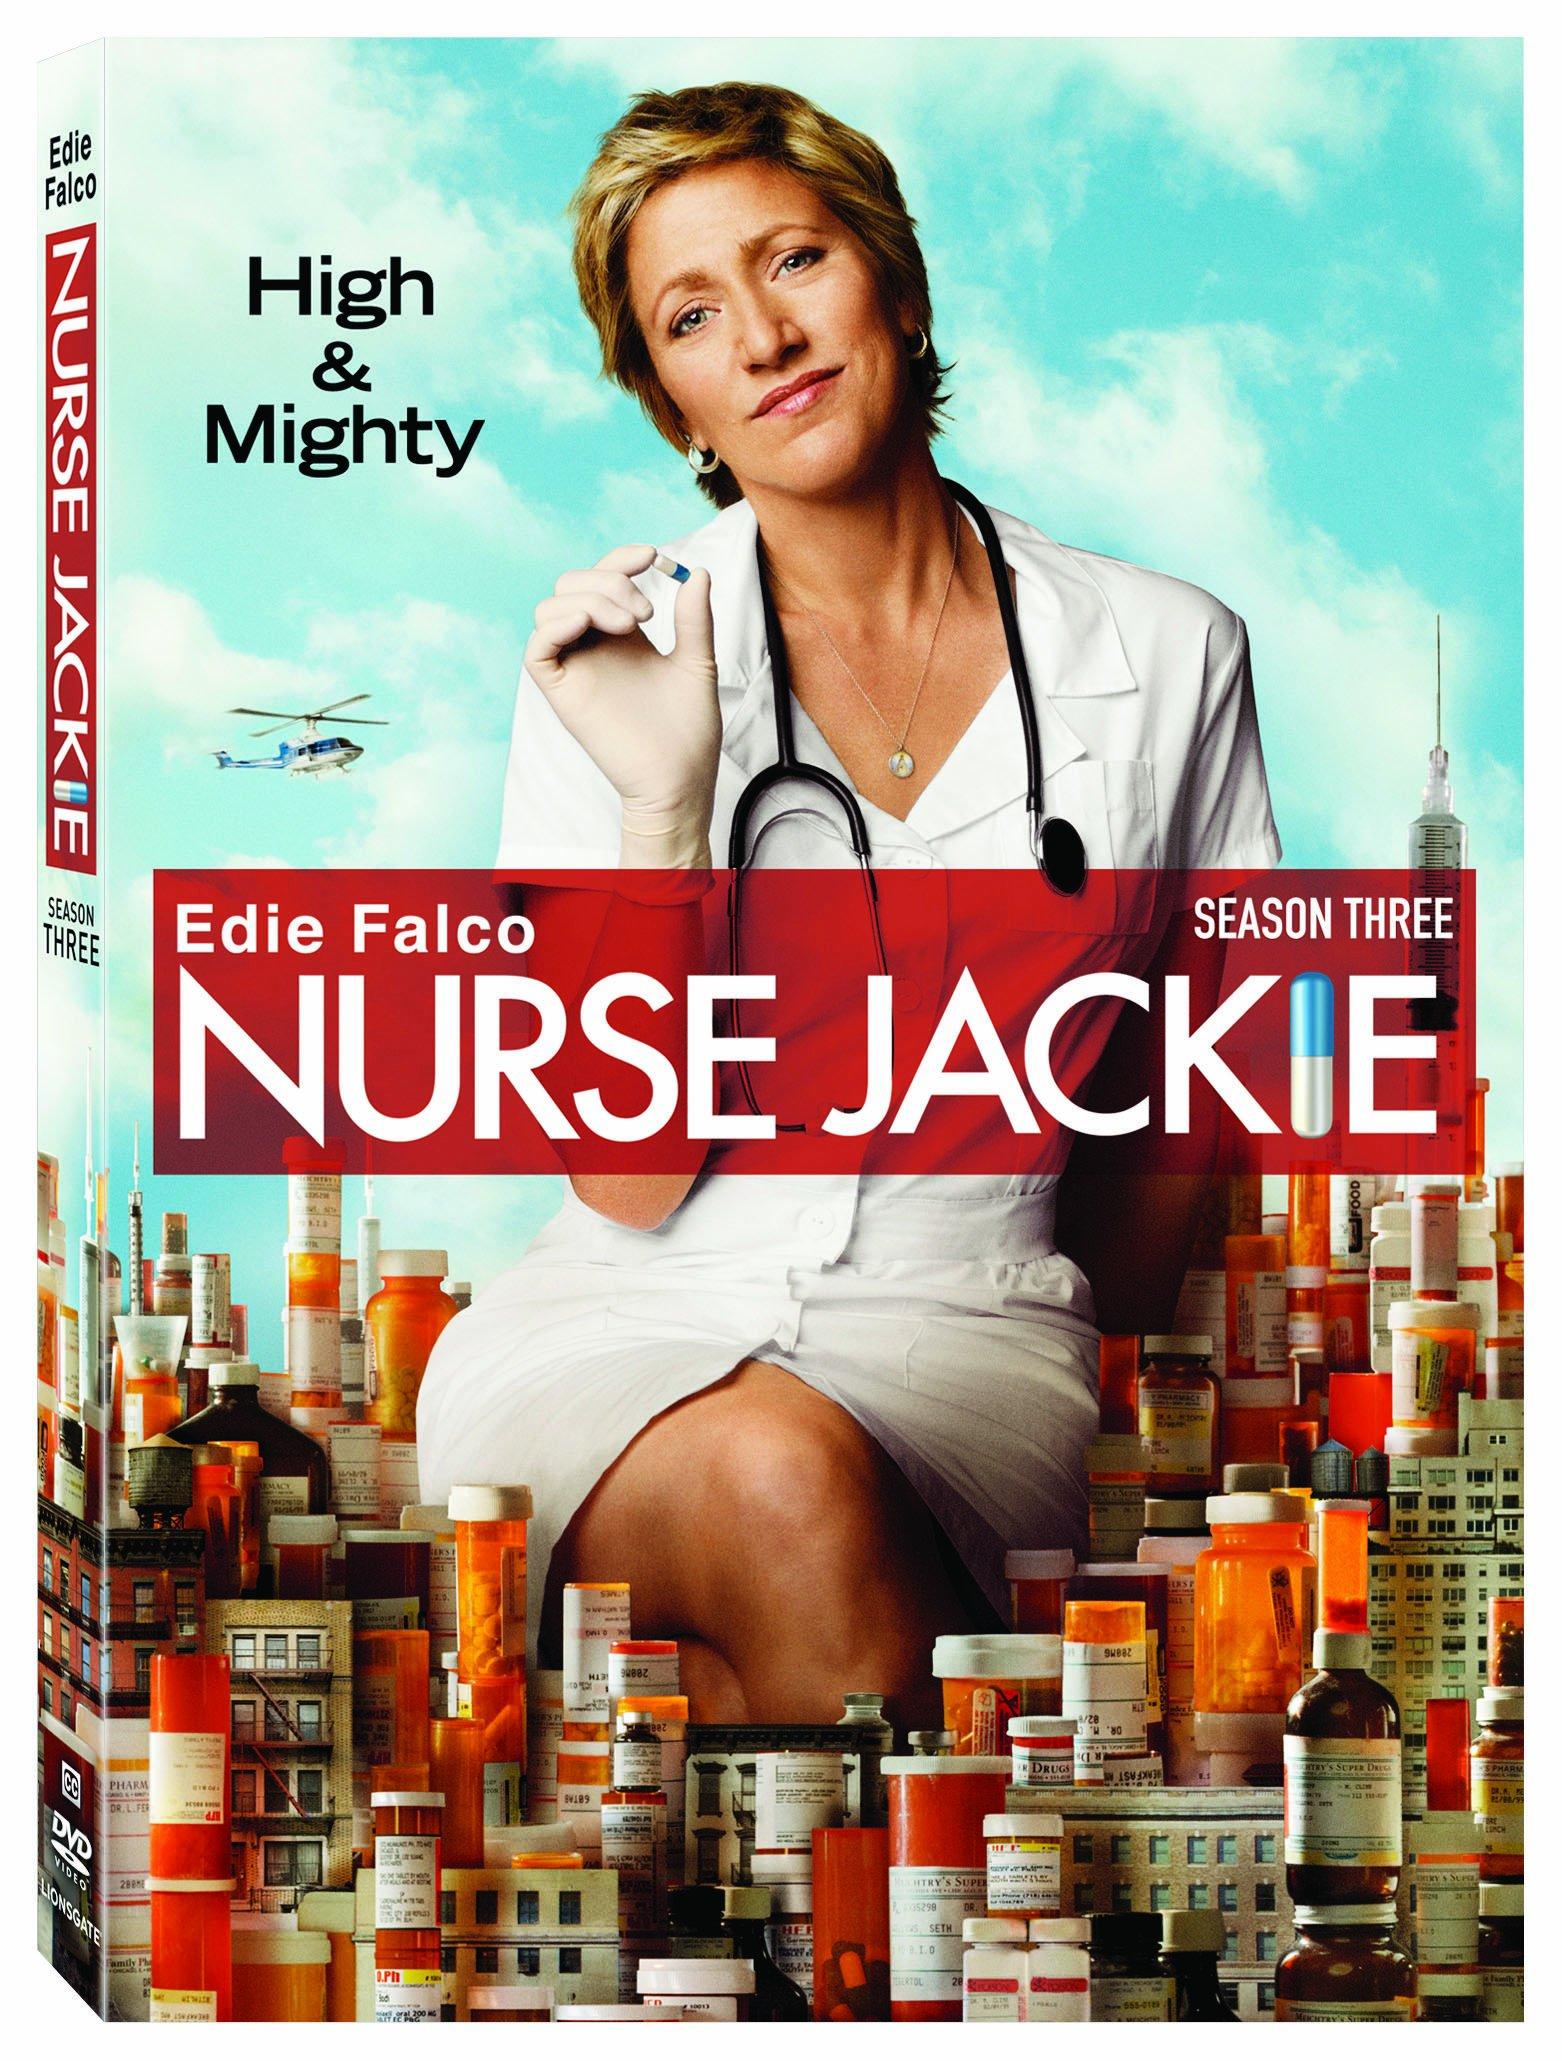 DVD : Nurse Jackie: Season 3 (Widescreen, Dolby, AC-3, 3 Disc)